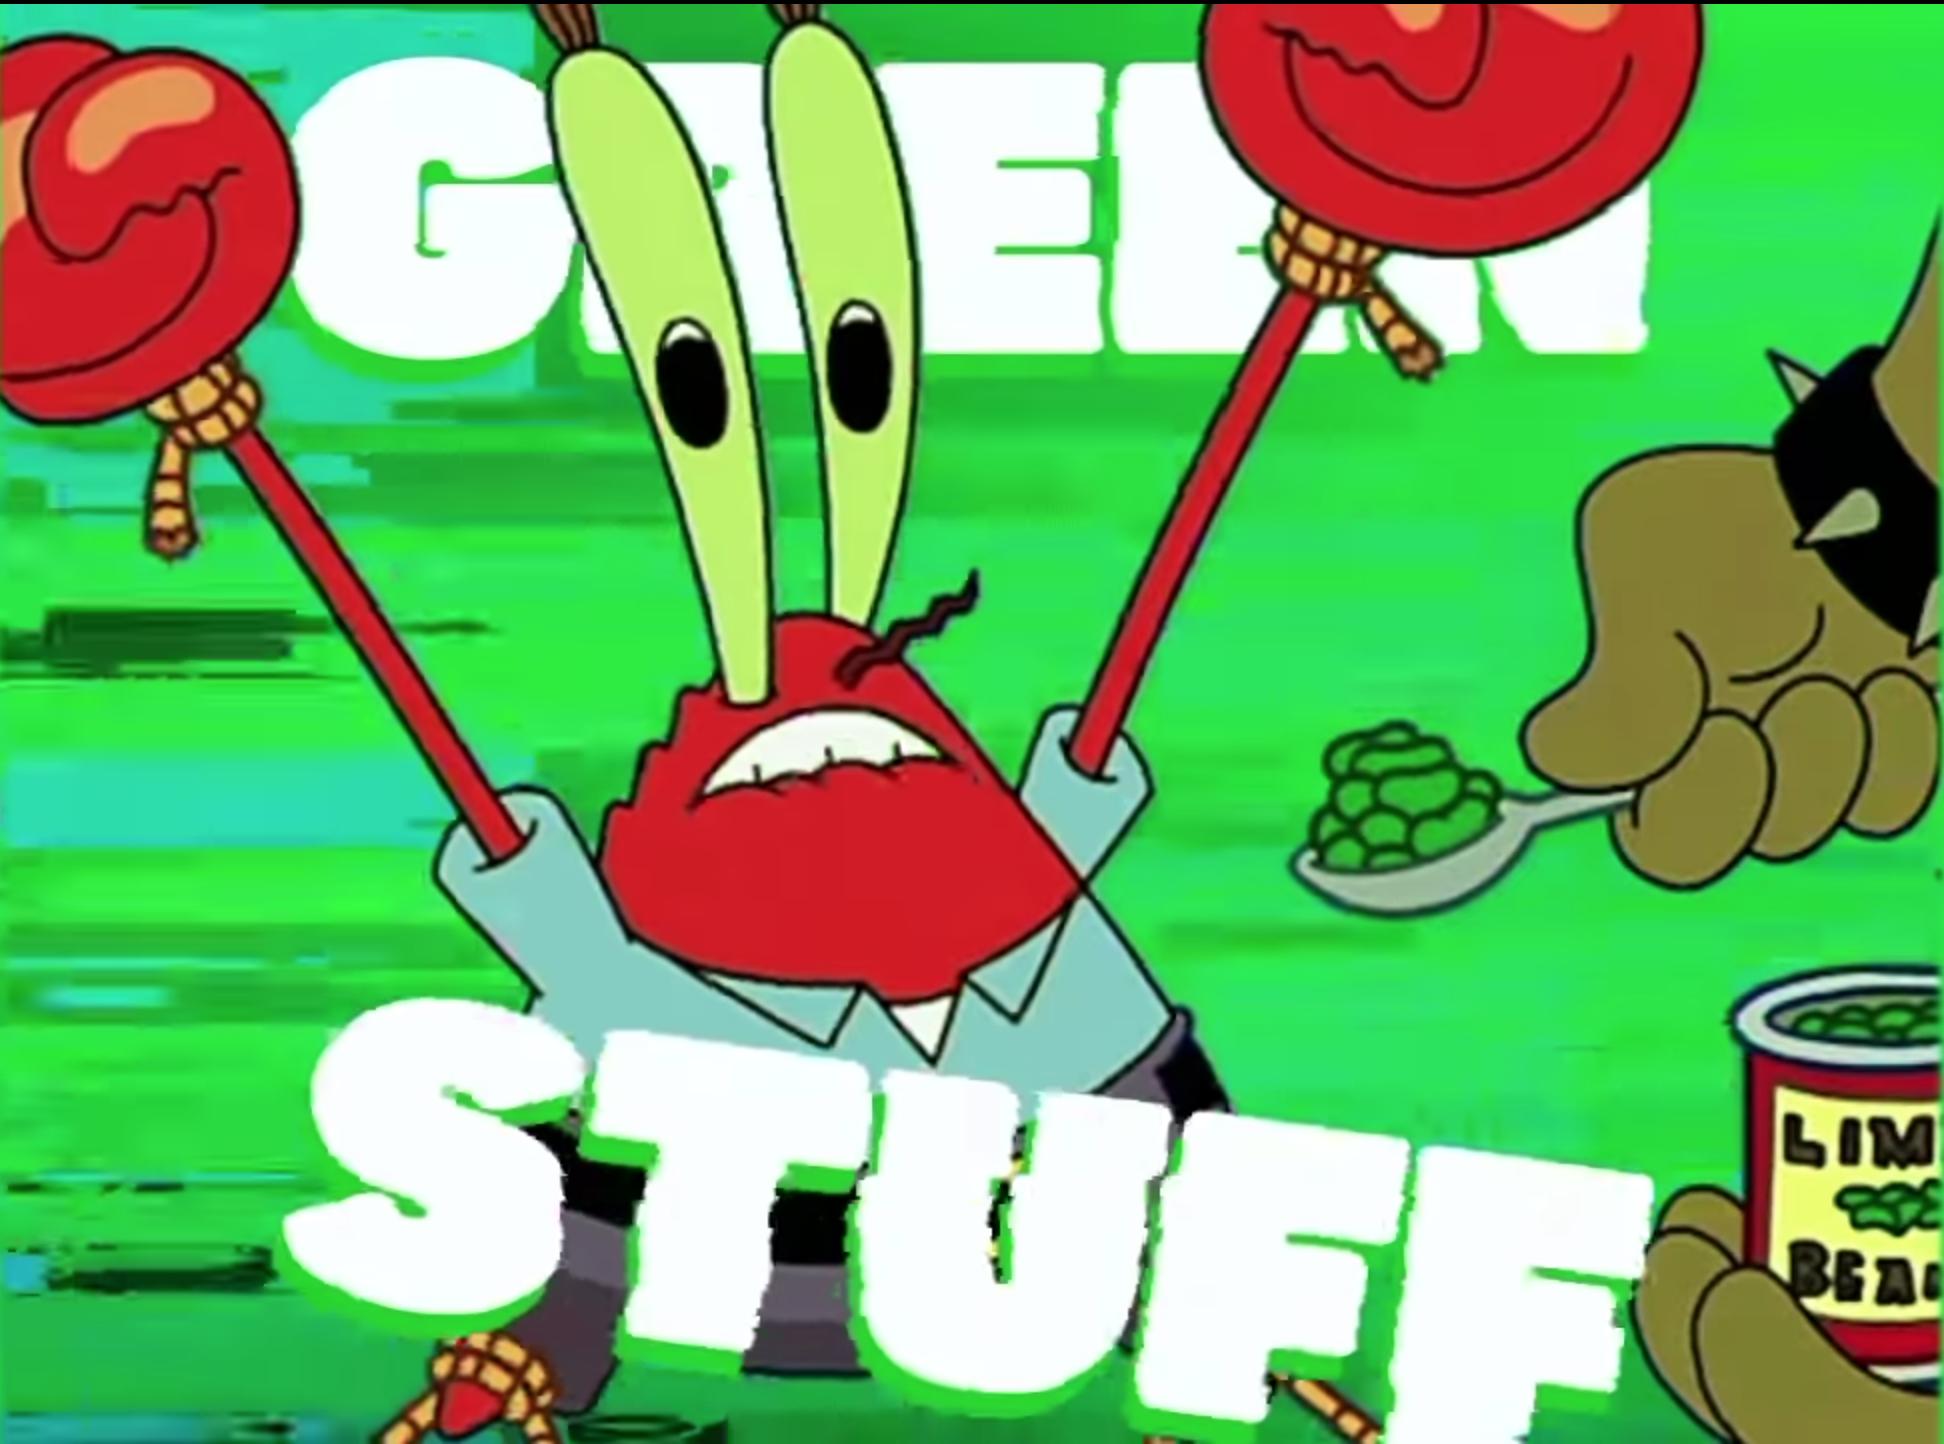 Green Stuff Rap